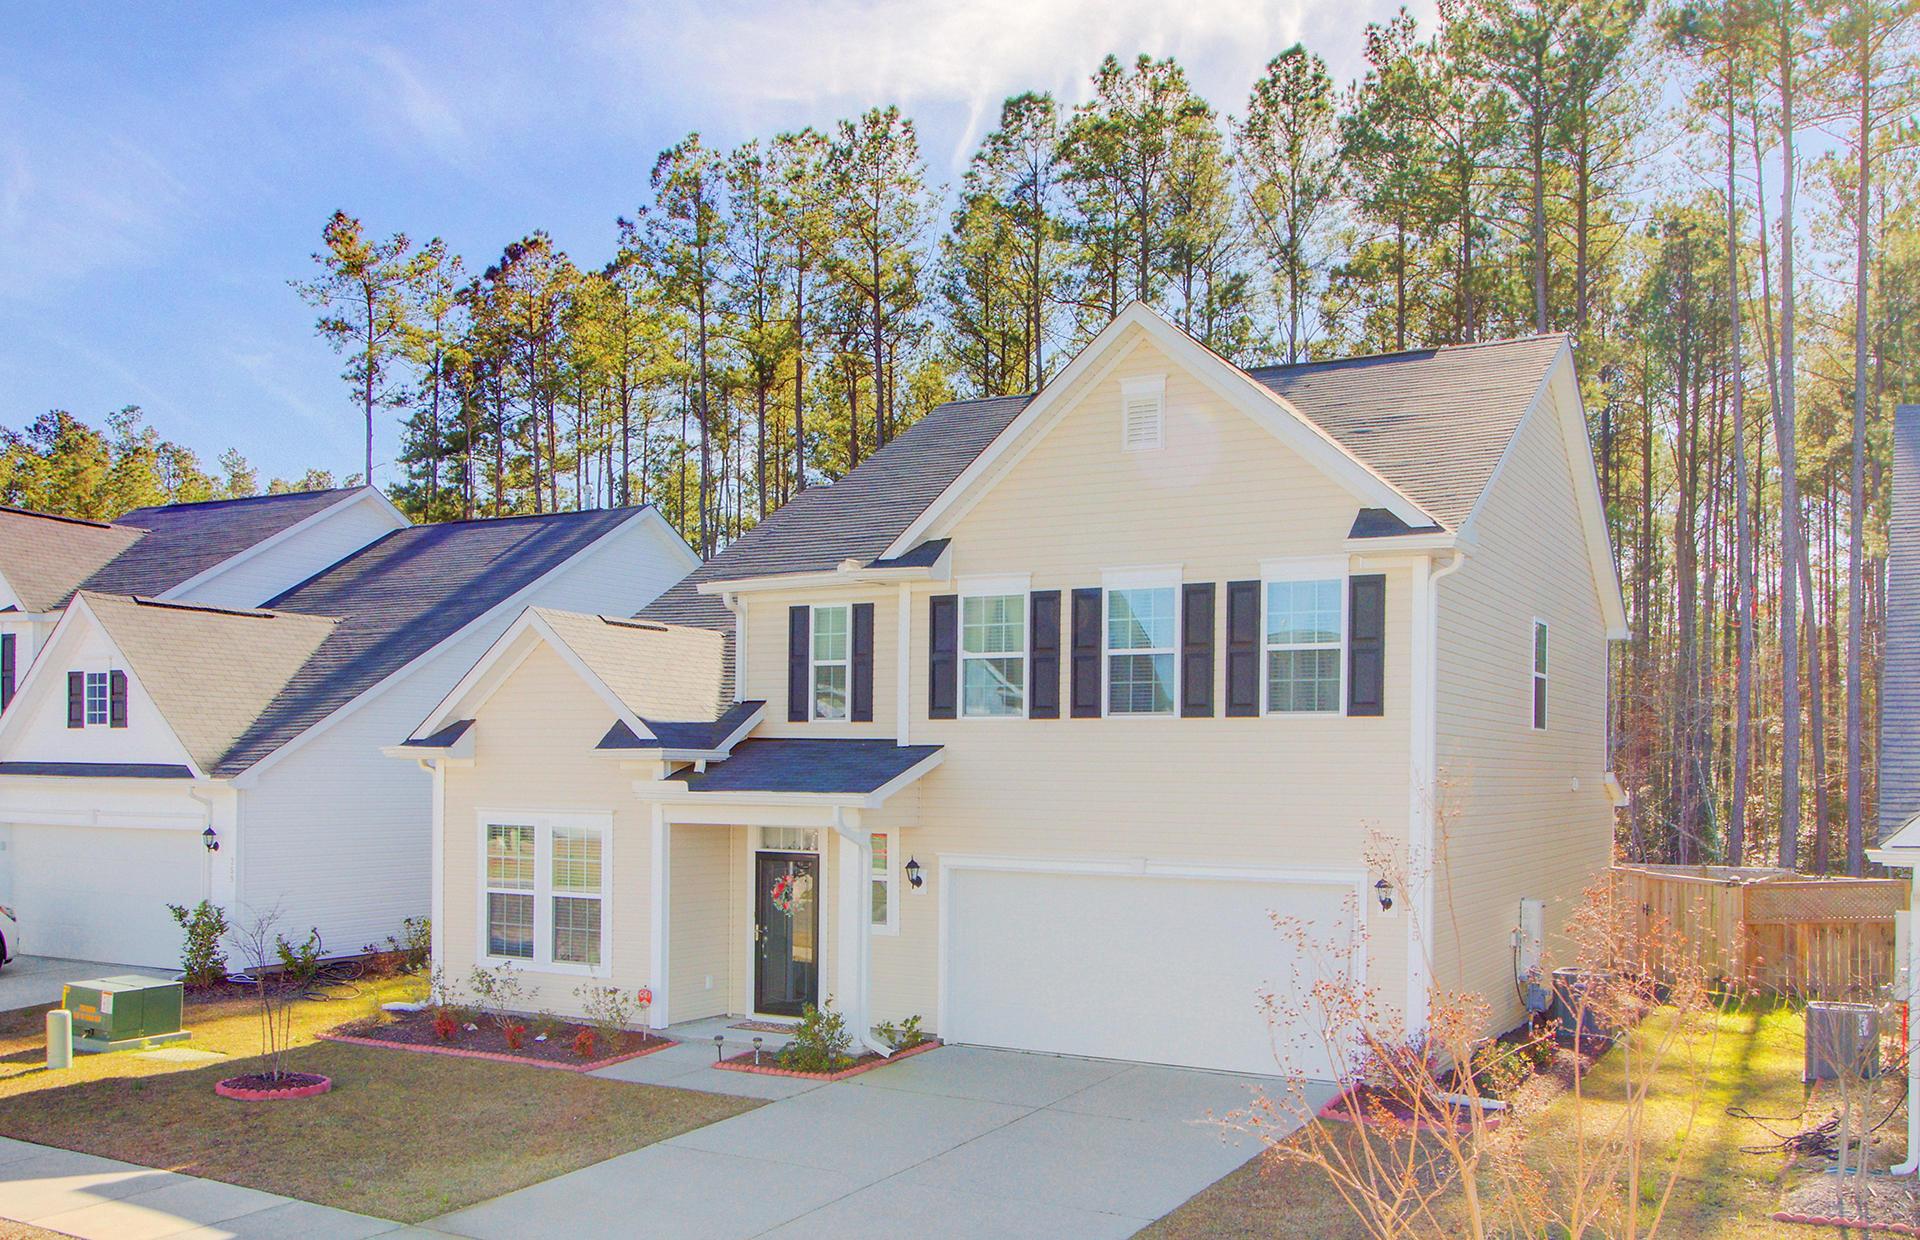 Cane Bay Plantation Homes For Sale - 255 Spectrum, Summerville, SC - 2